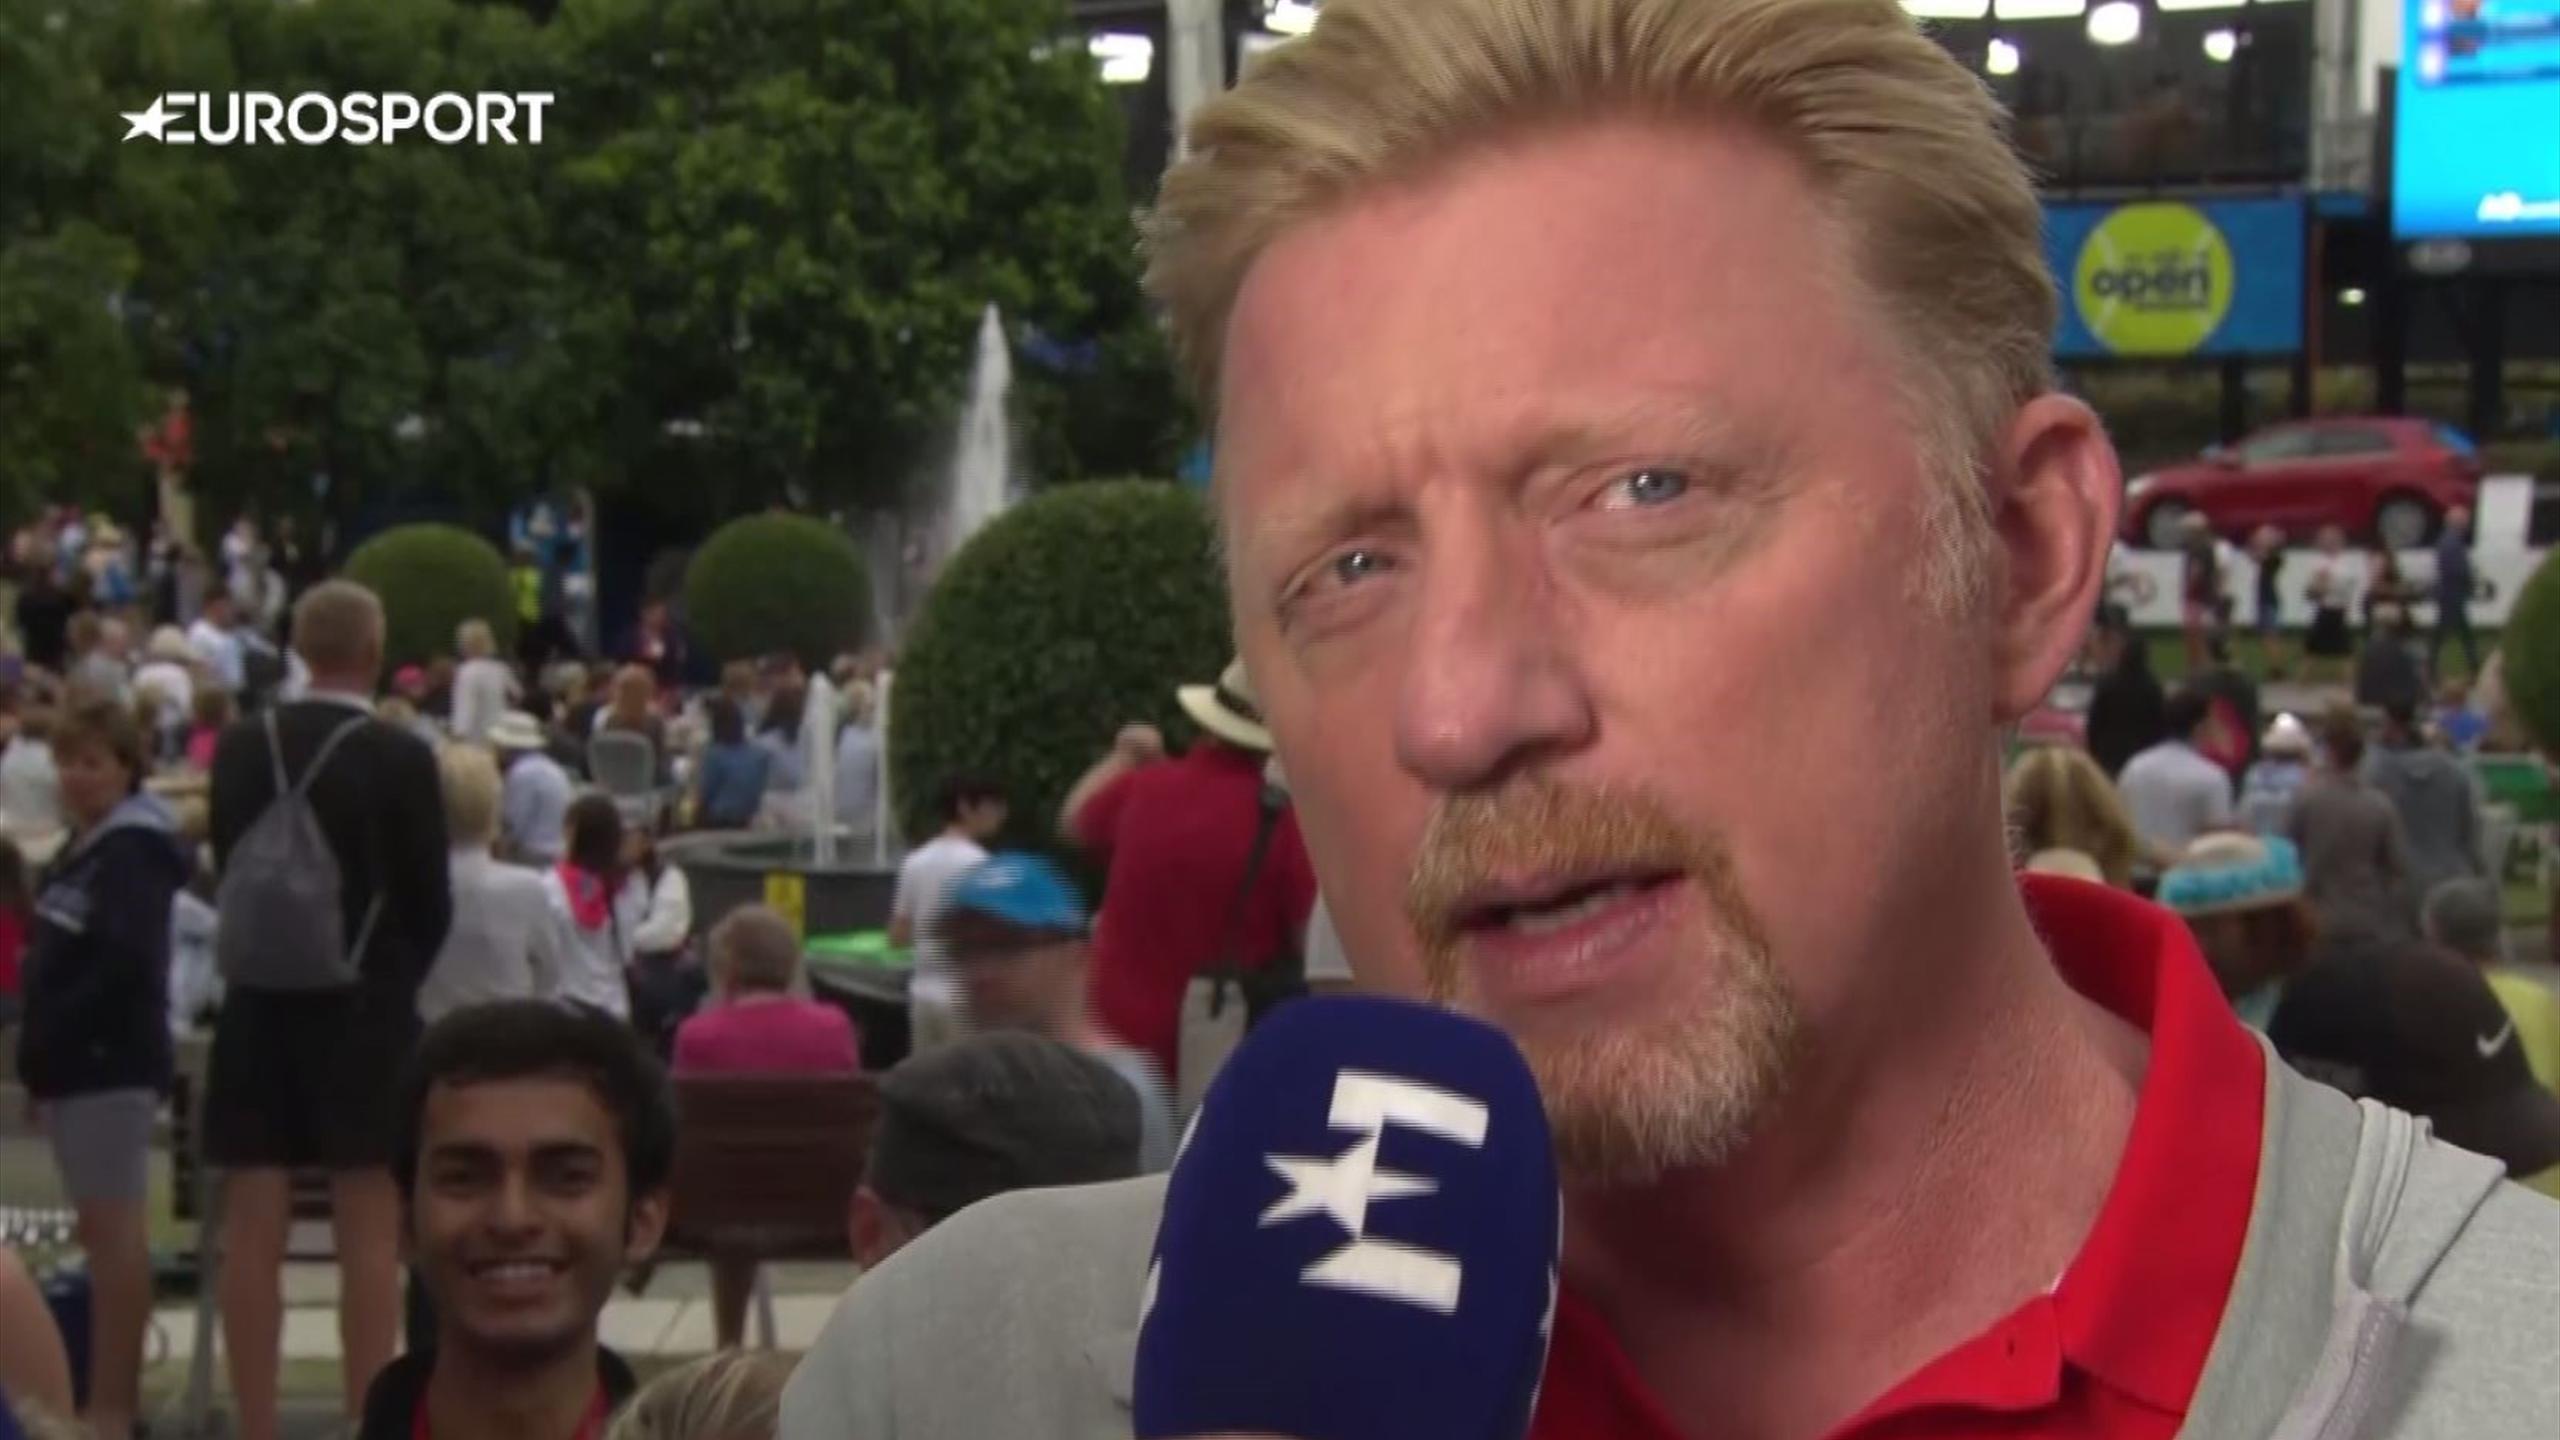 Boris Becker reacts to Djokovic exit